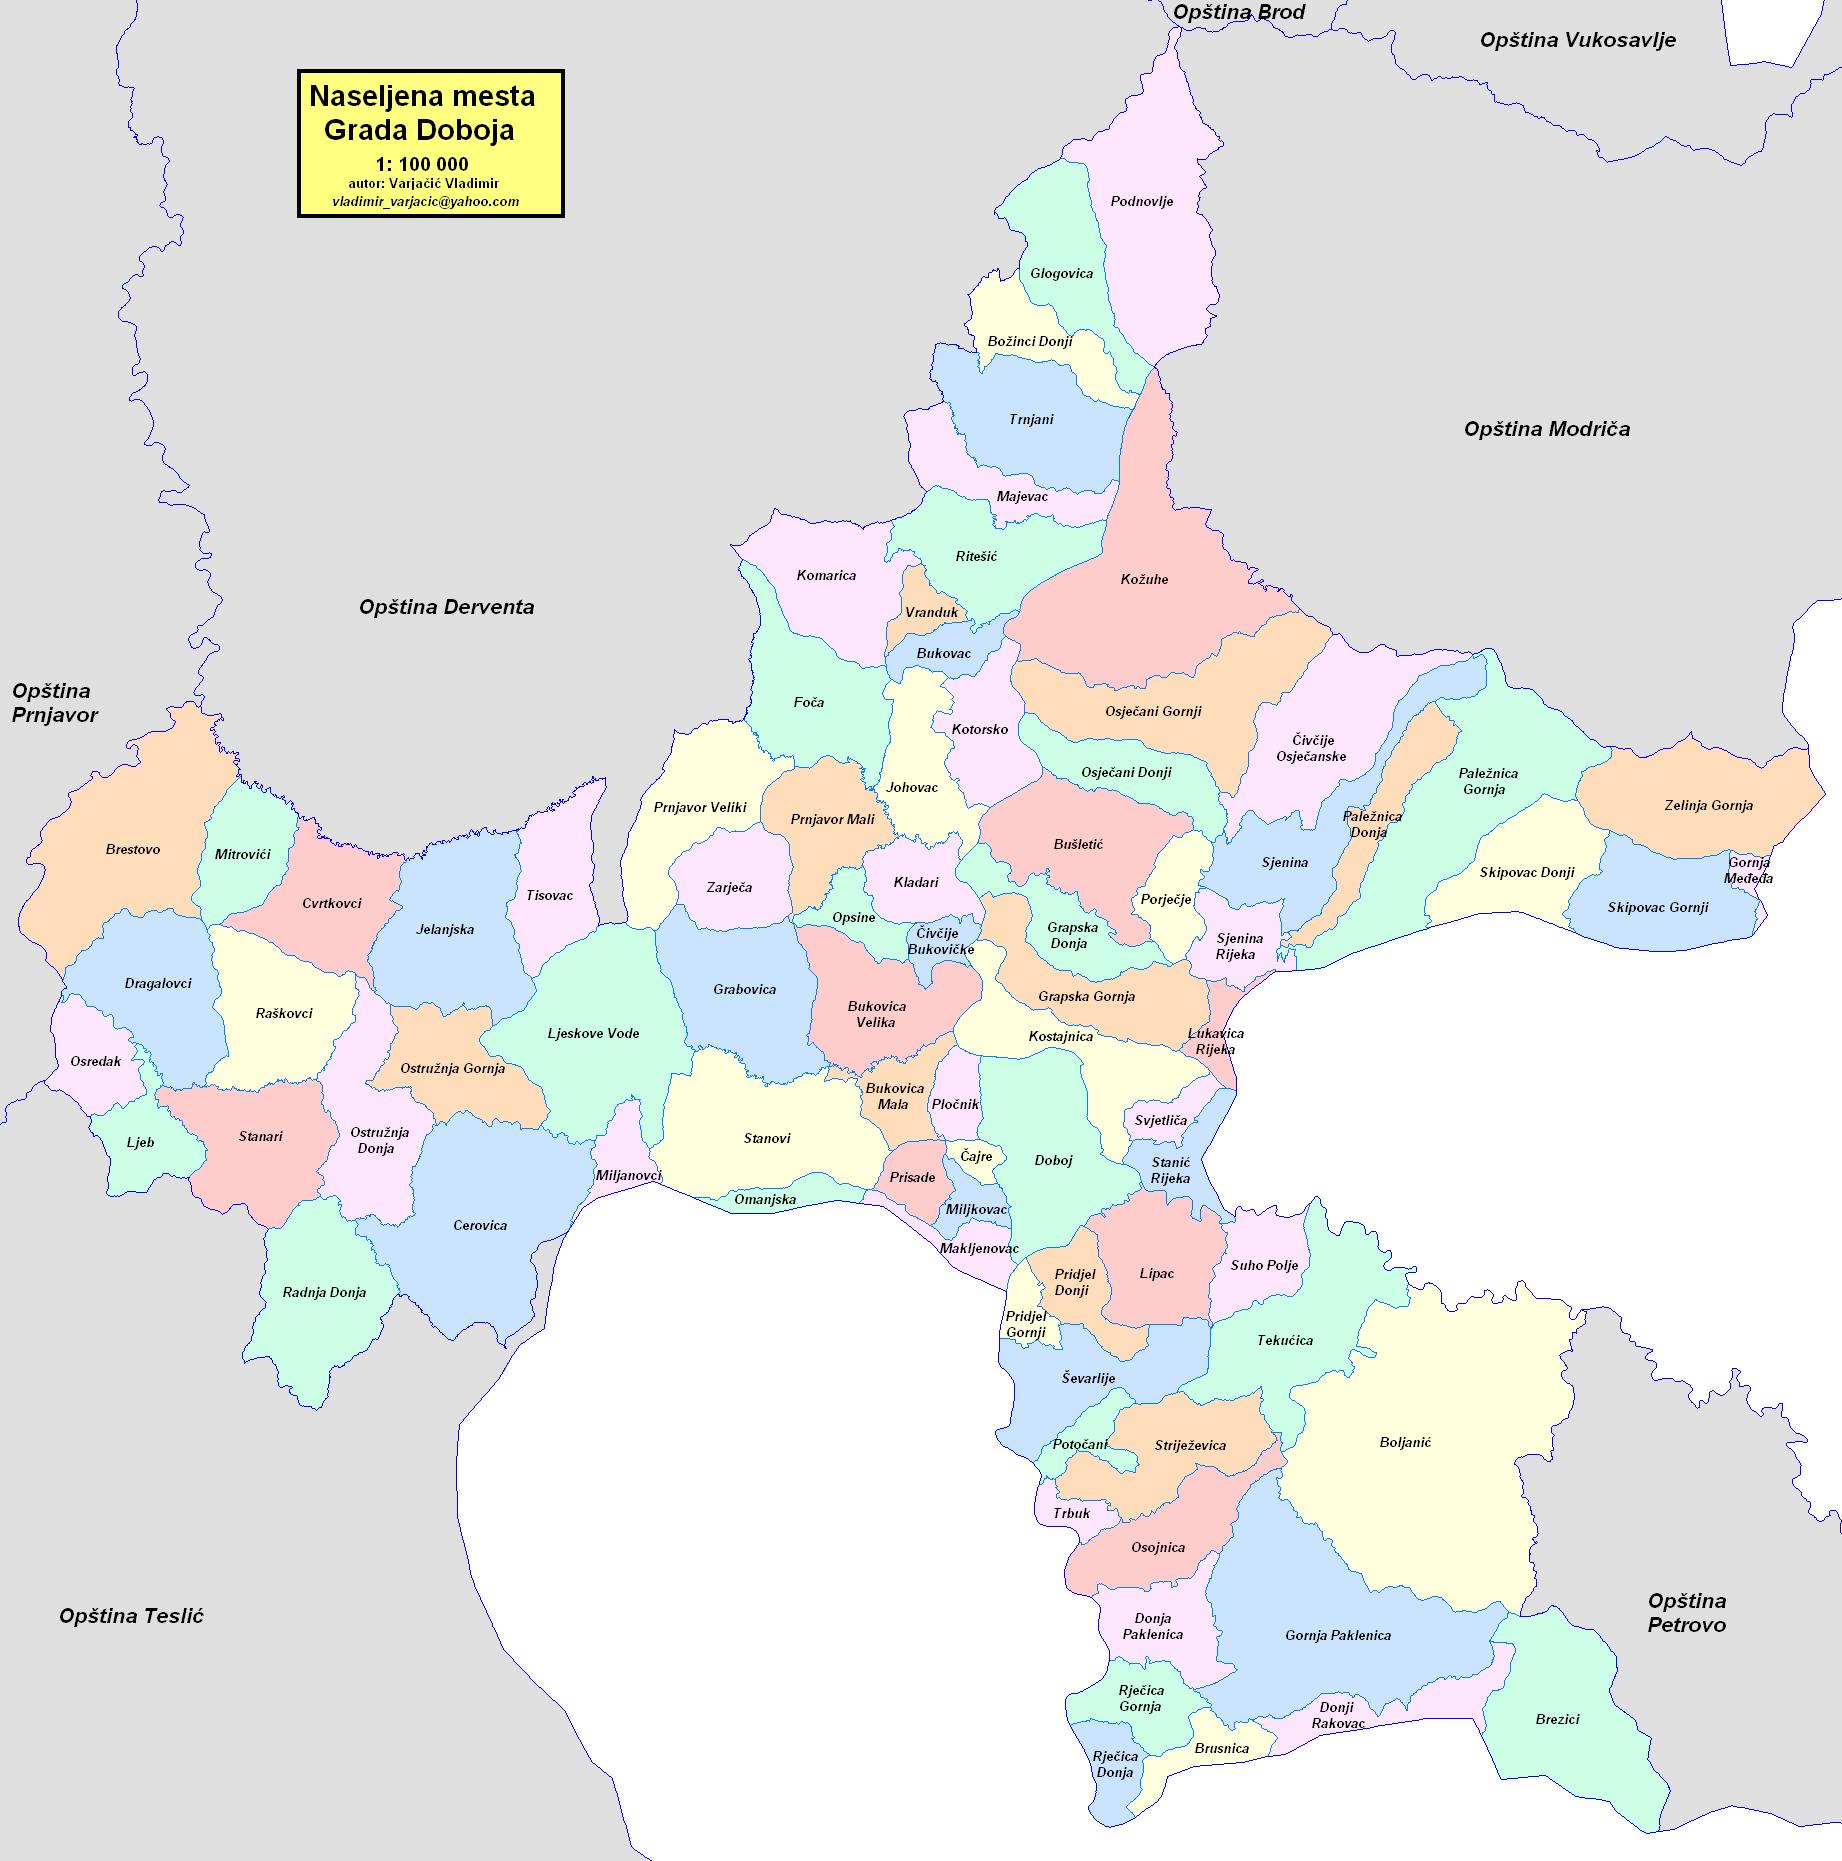 doboj mapa ملف:Doboj naselja2014.png   ويكيبيديا، الموسوعة الحرة doboj mapa